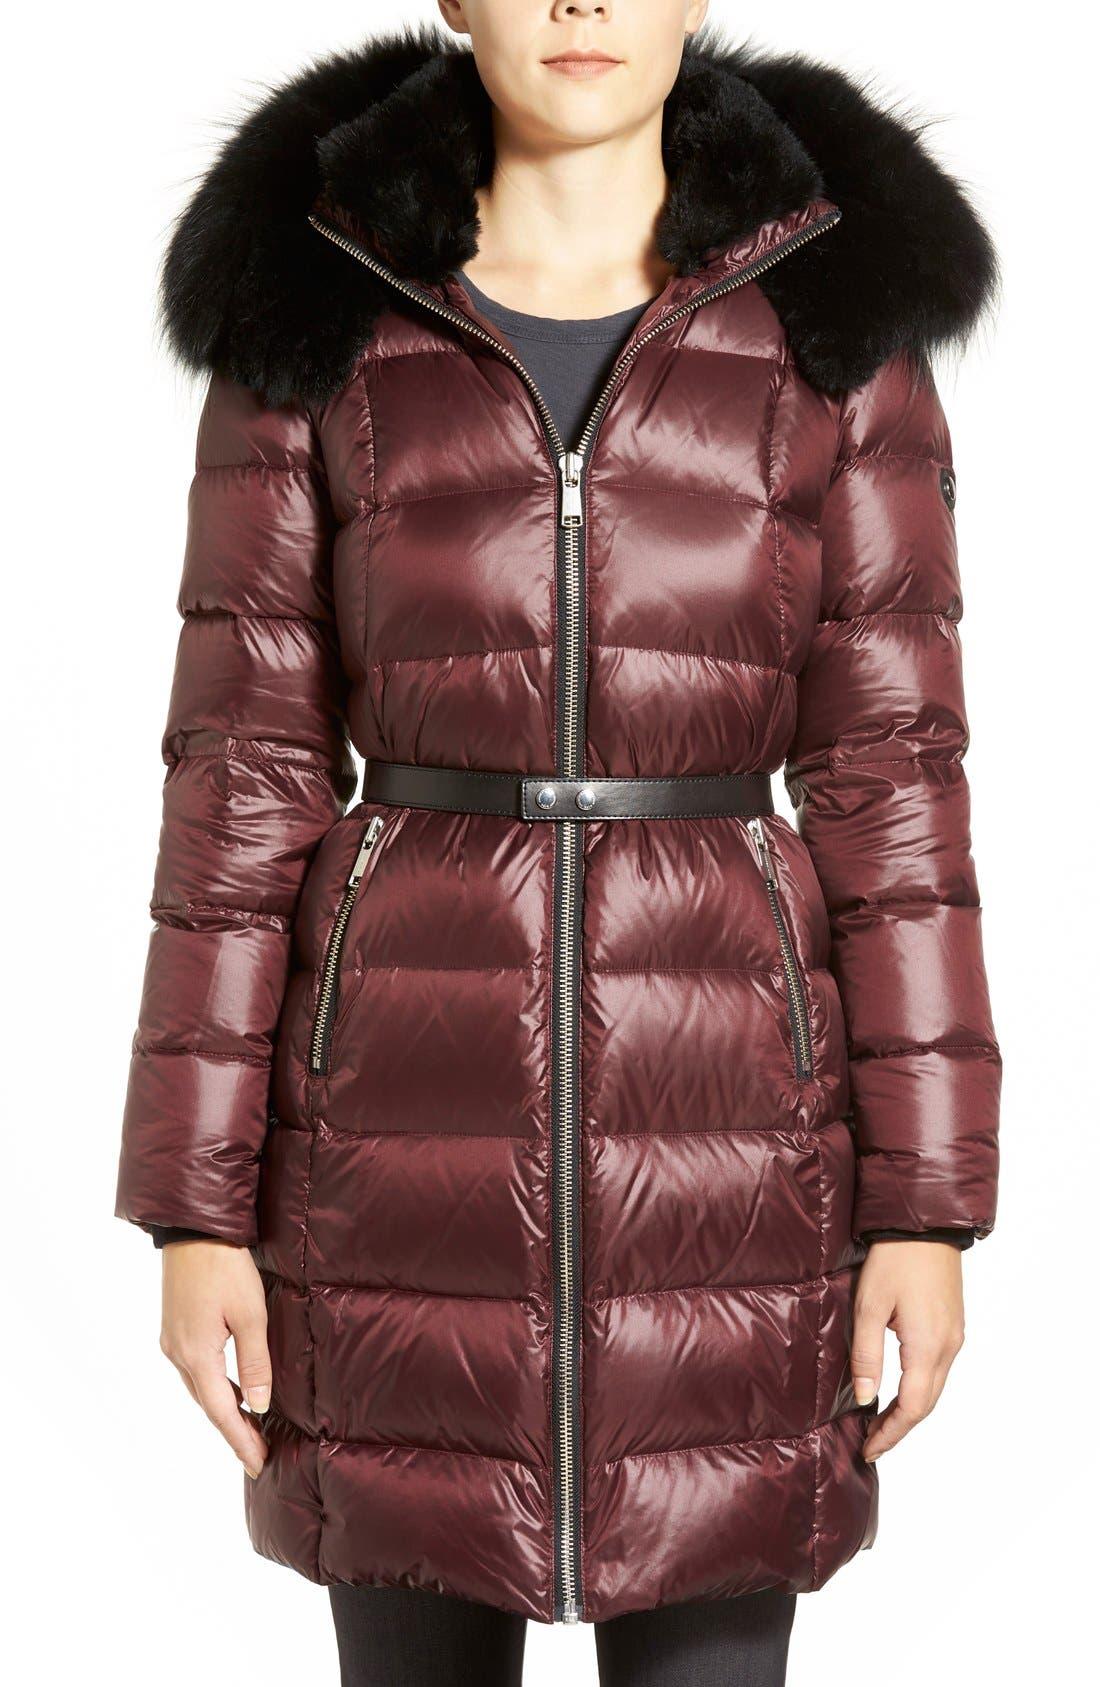 Alternate Image 1 Selected - Andrew Marc 'Tatiana' Belted Down Coat with Genuine Fox & Rabbit Fur Trim